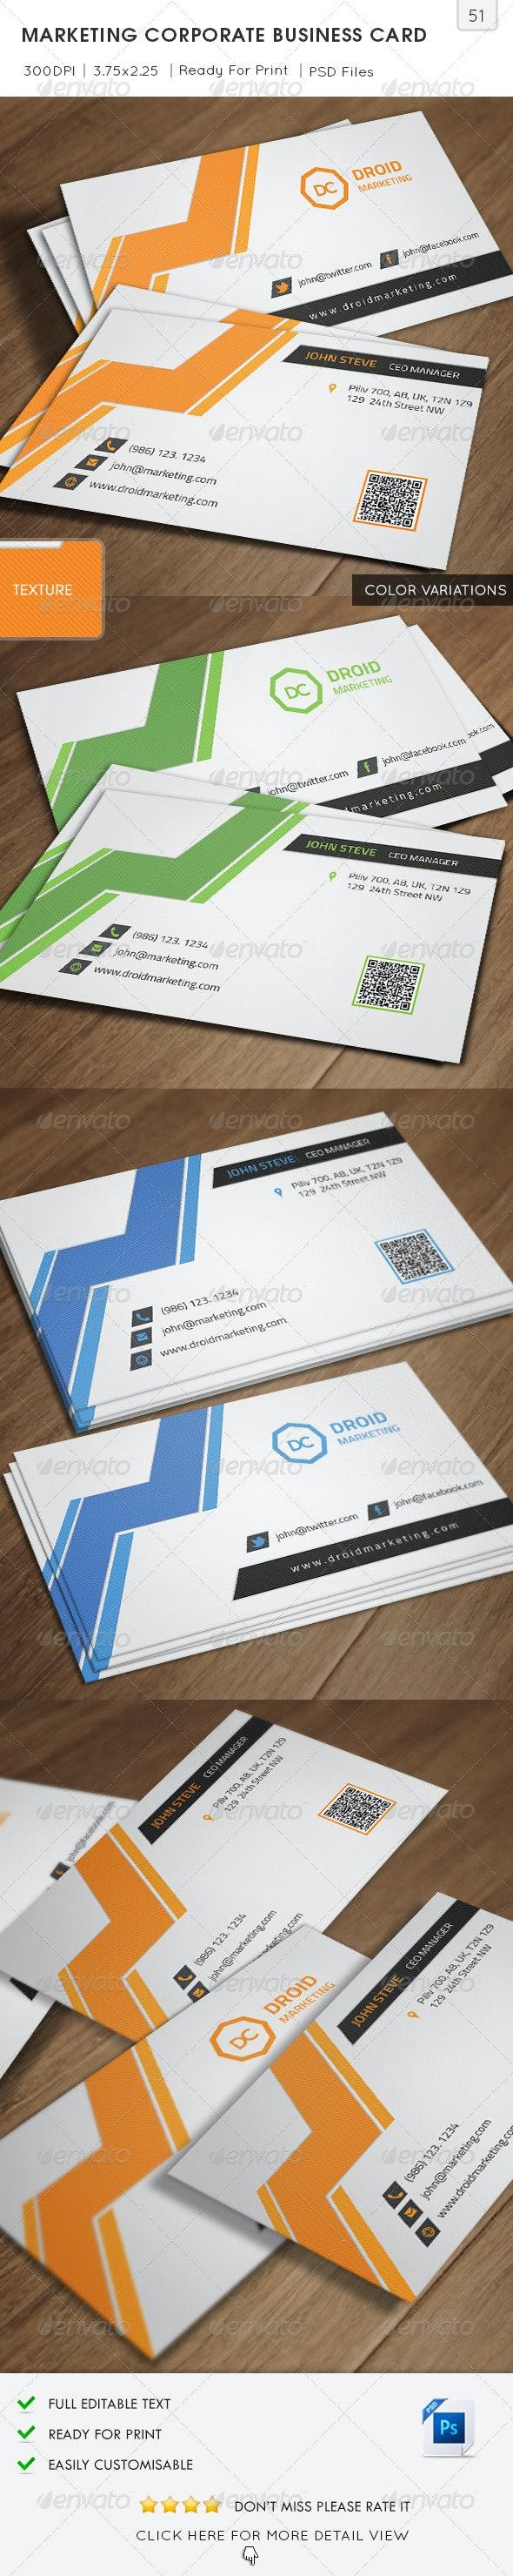 Marketing Corporate Business Card - Corporate Business Cards